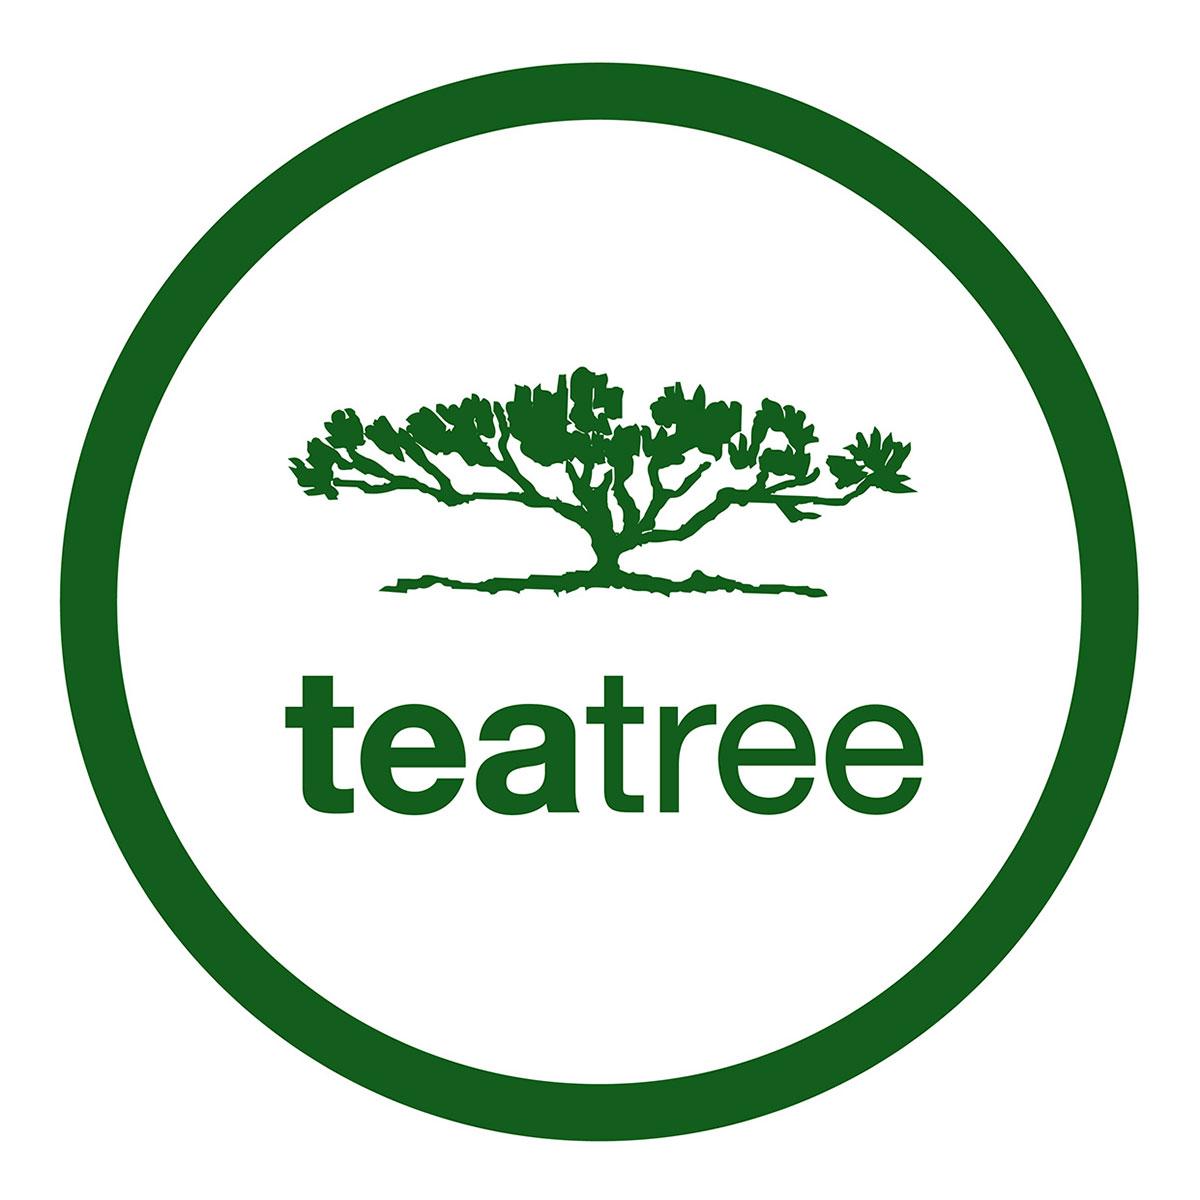 teatree_logo.jpg